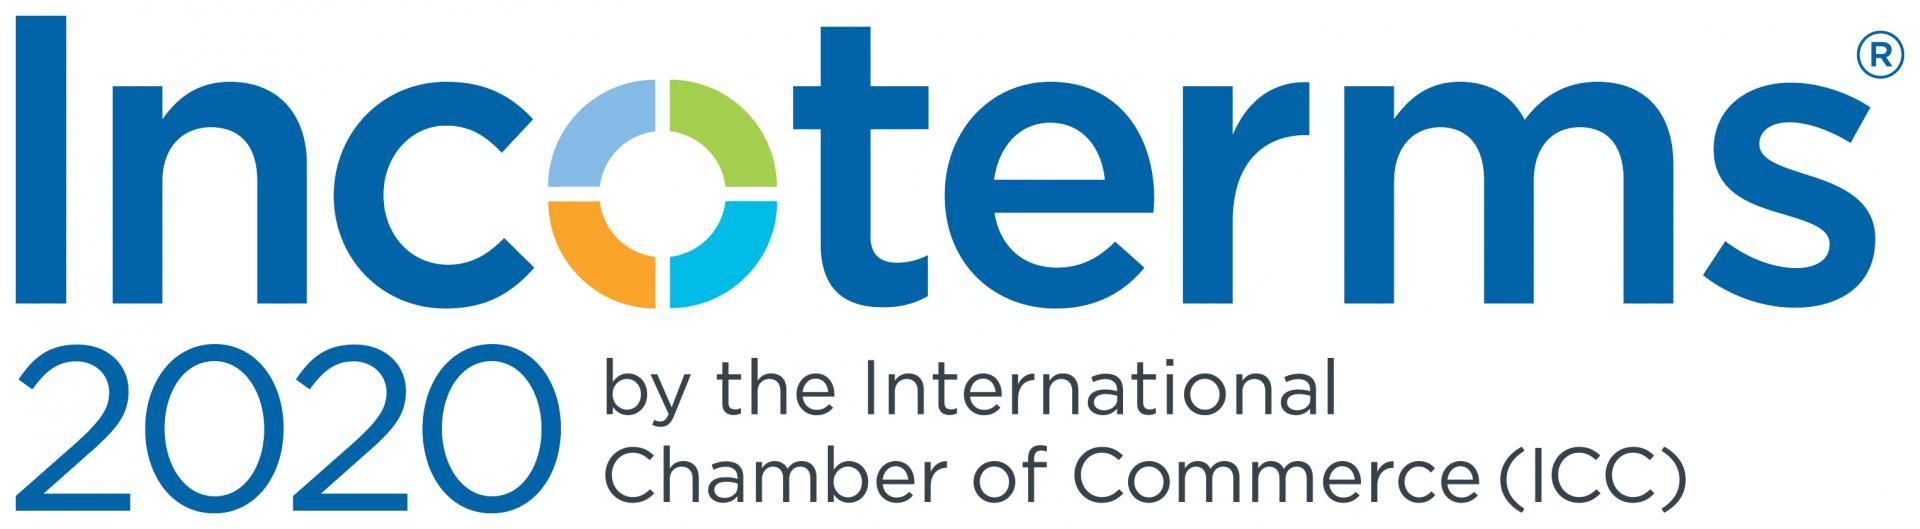 Icc incoterms 2020 logo